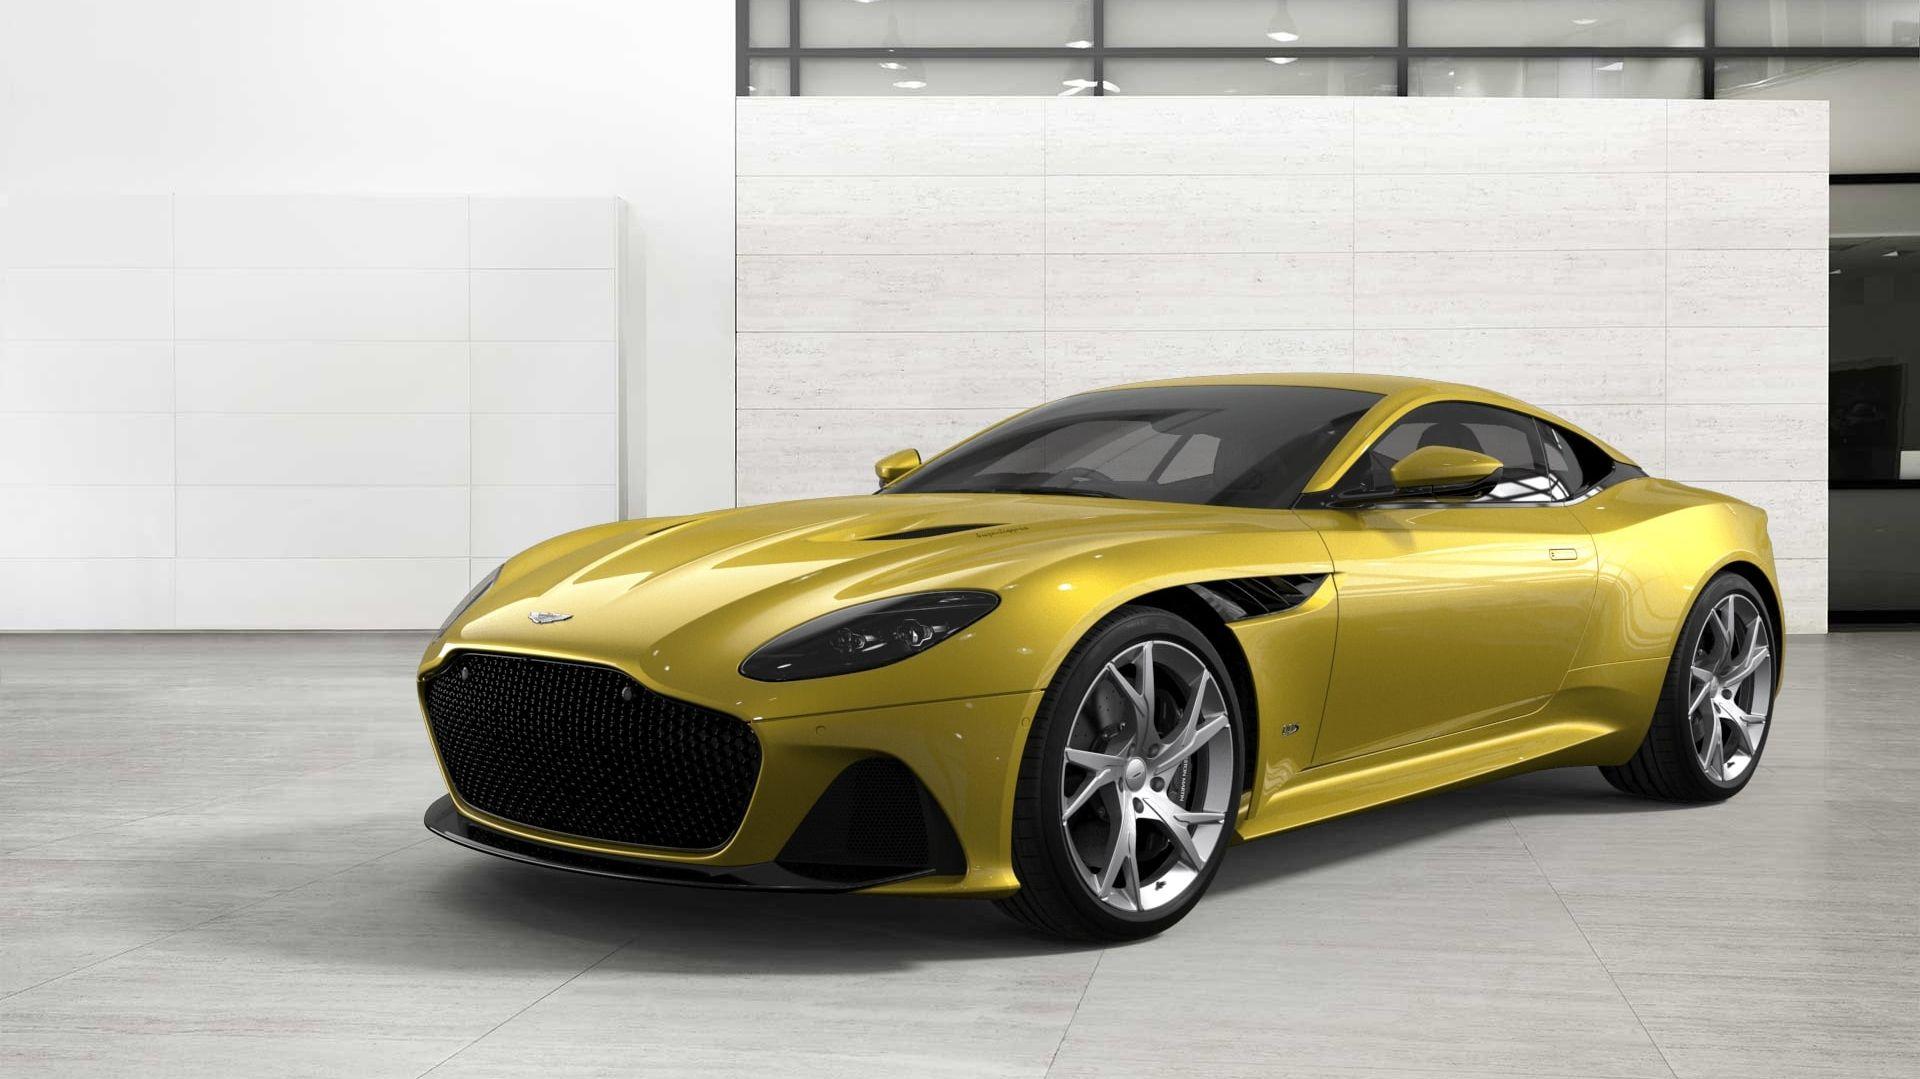 2019 Aston Martin Dbs Superleggera How We D Spec It Cars Cars